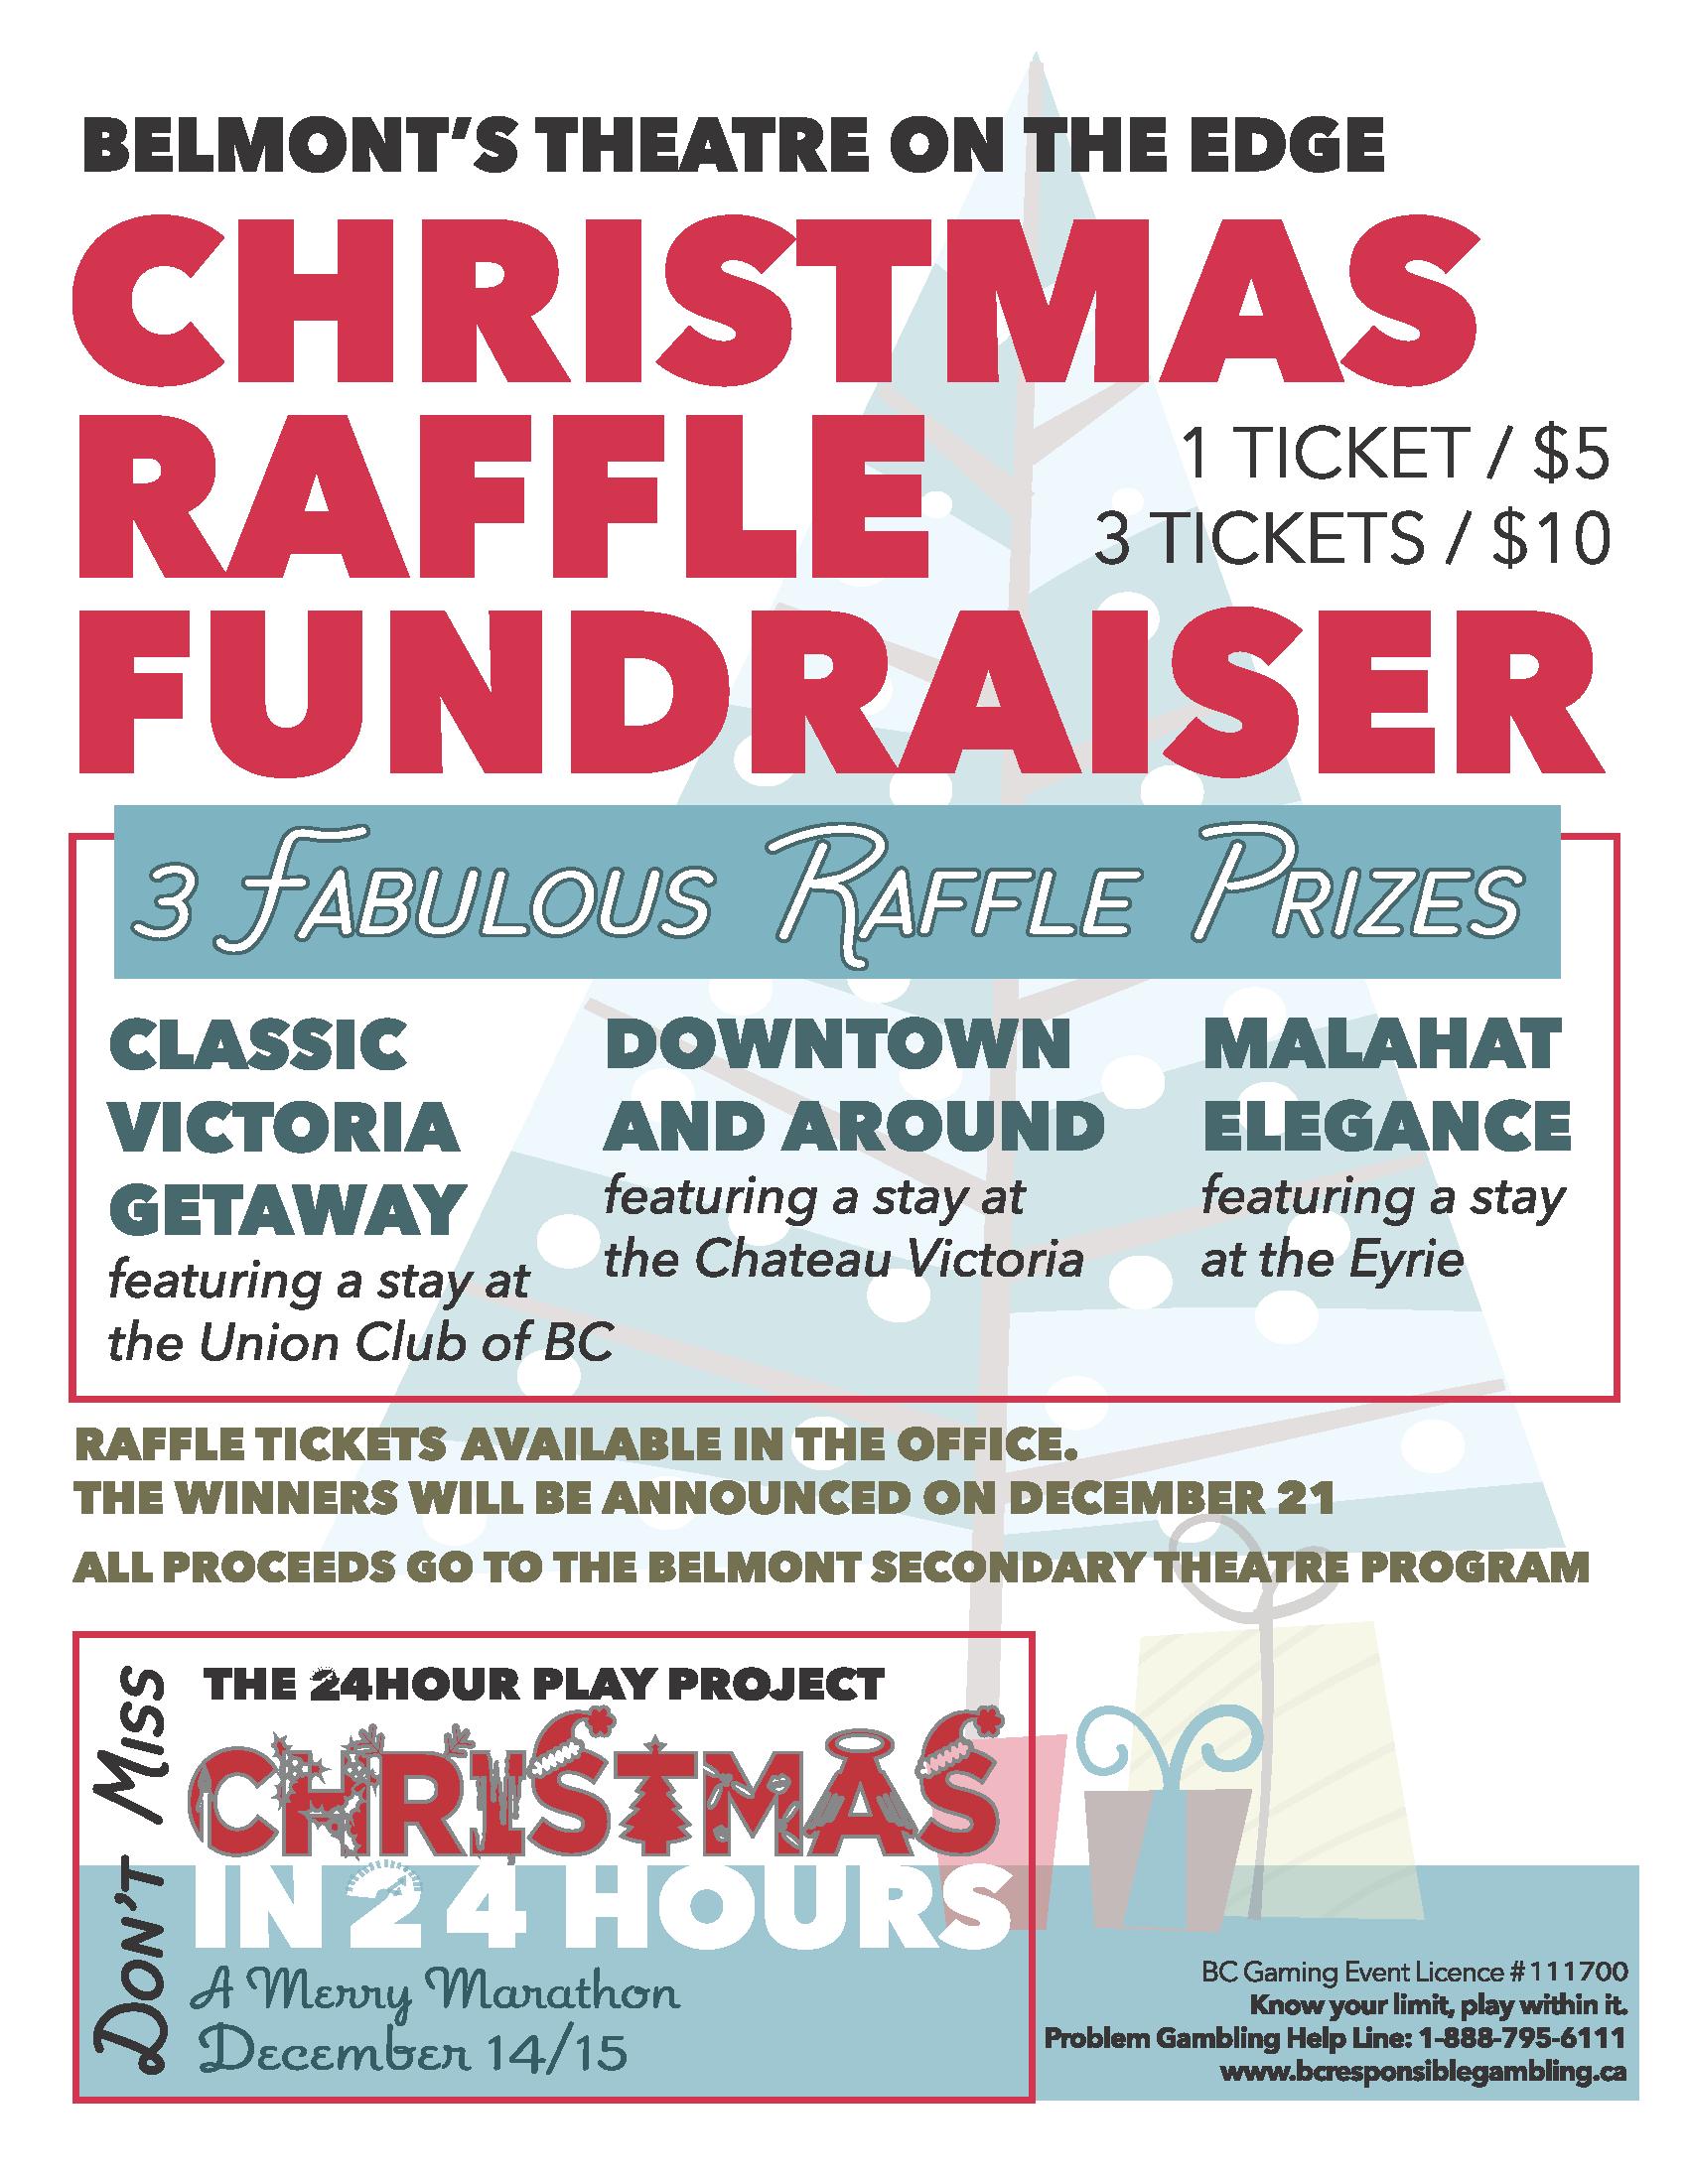 Christmas Raffle Fundraiser.png